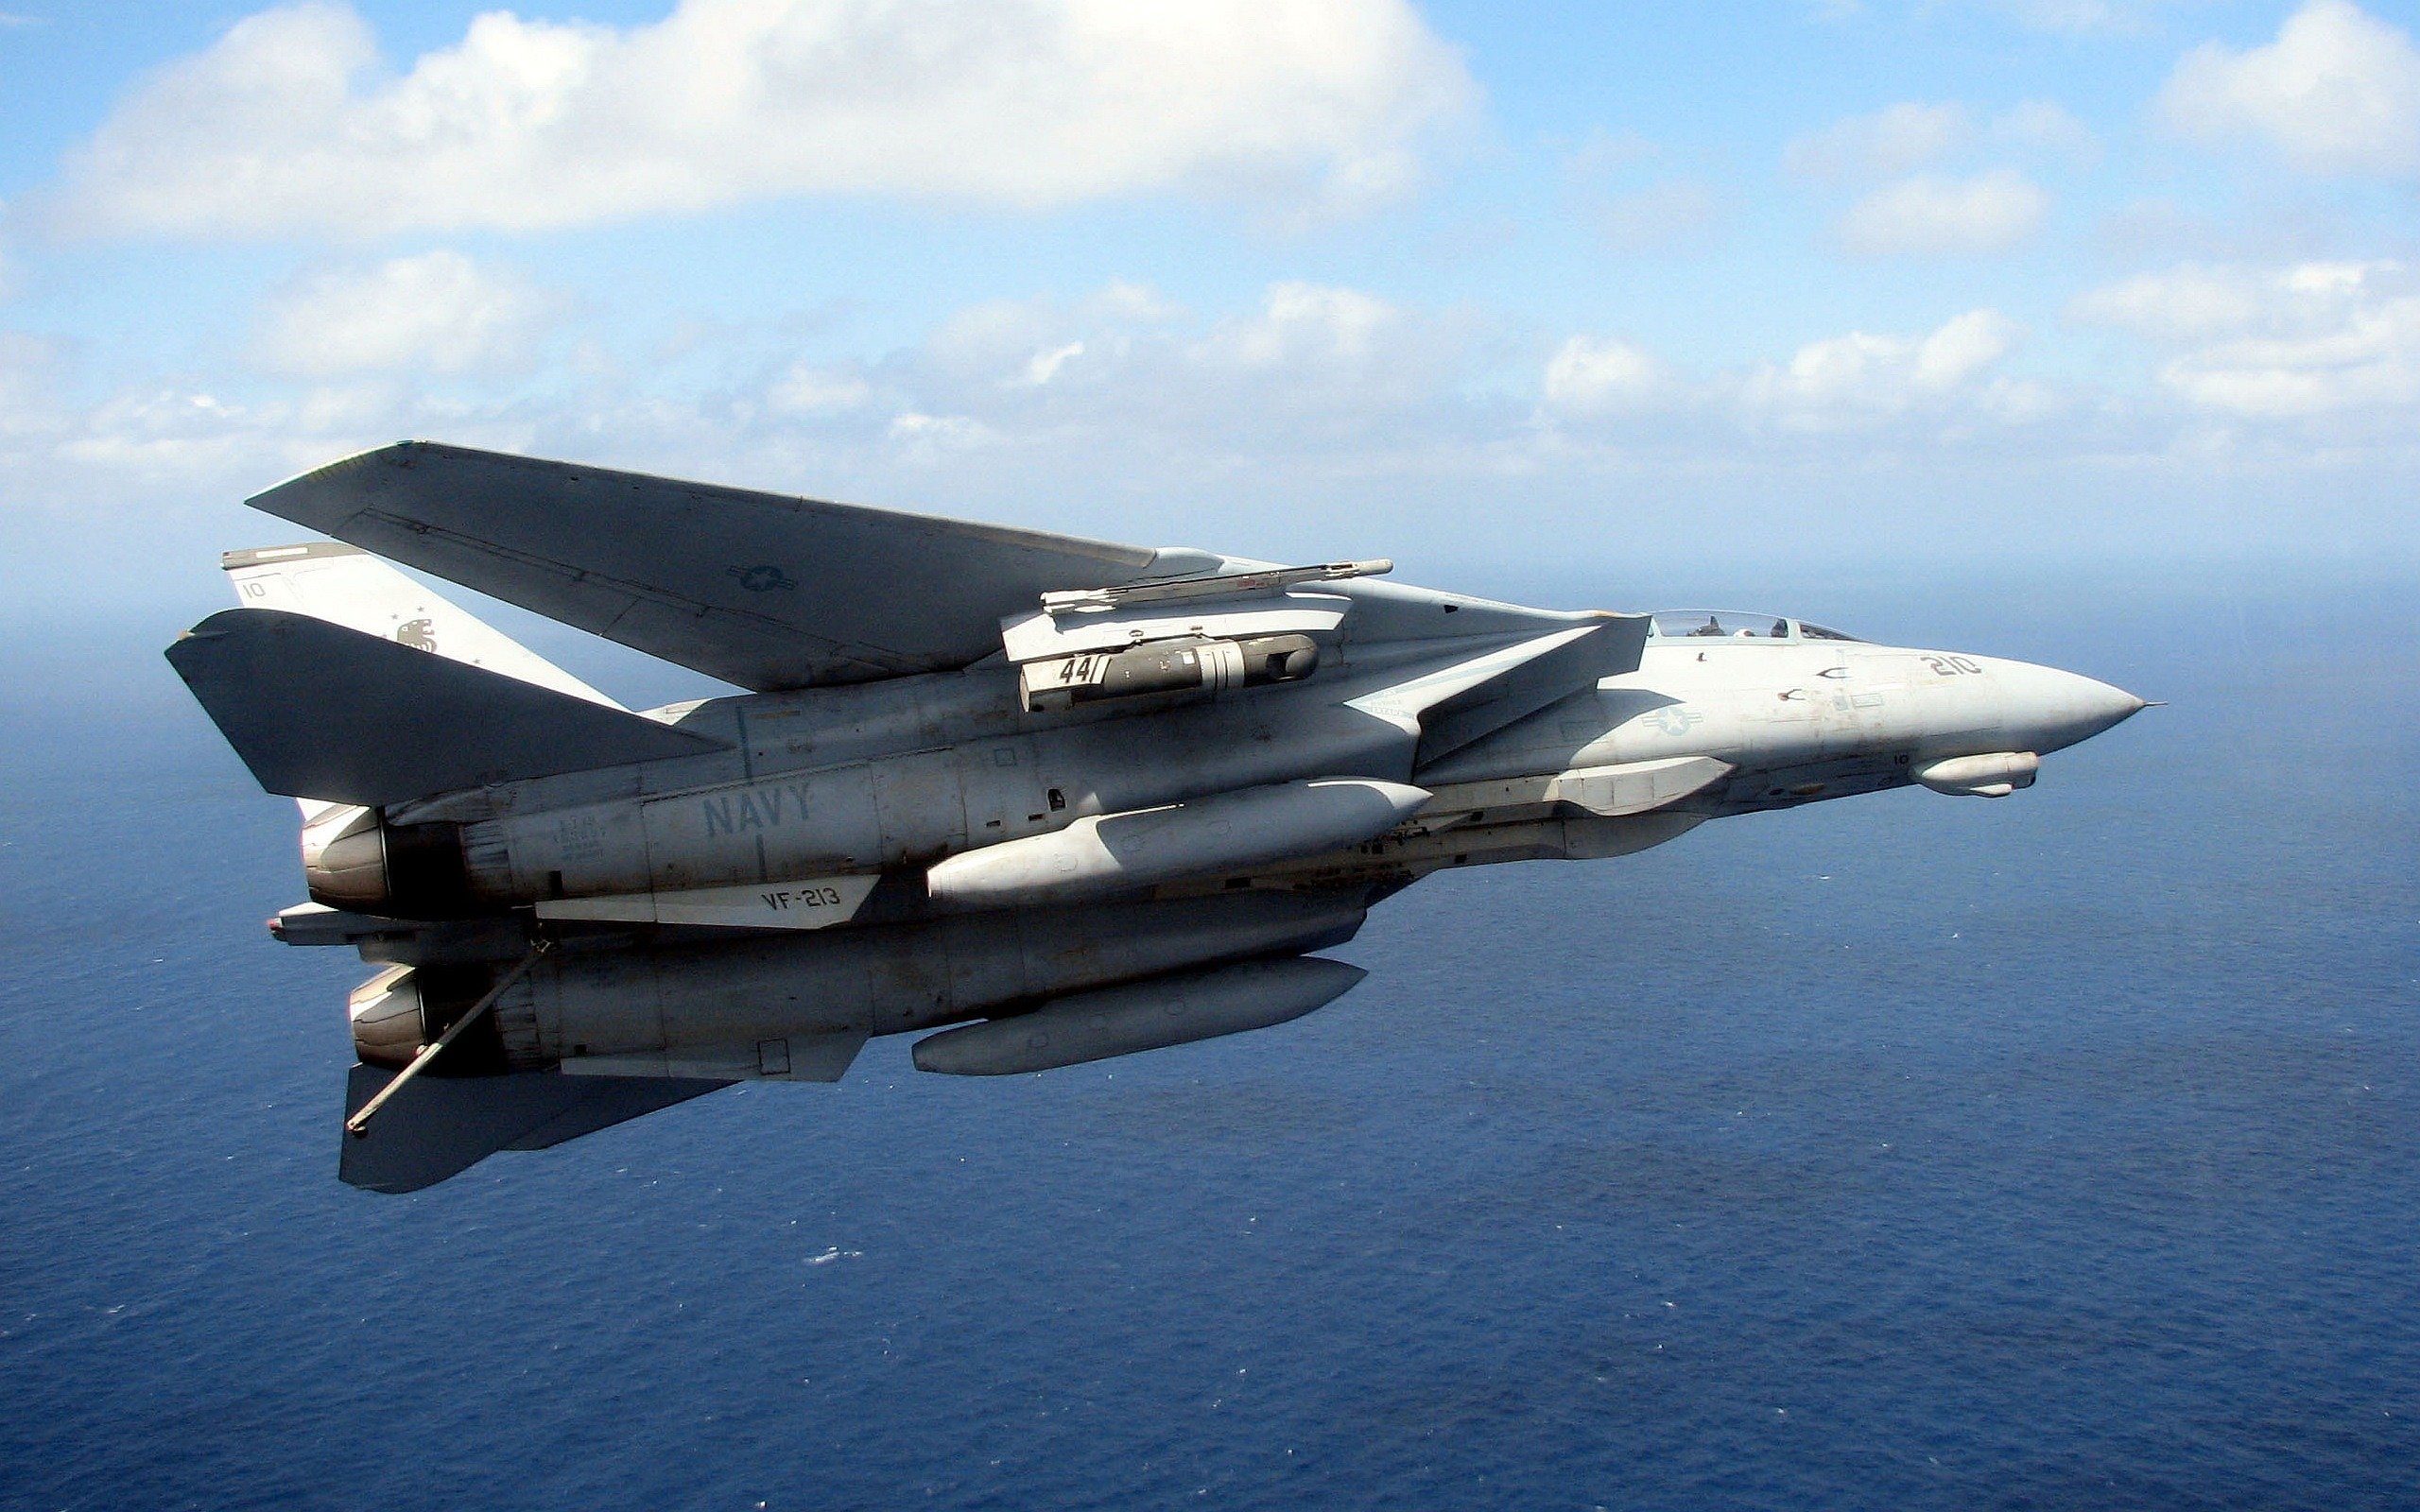 US Navy F14 Tomcat